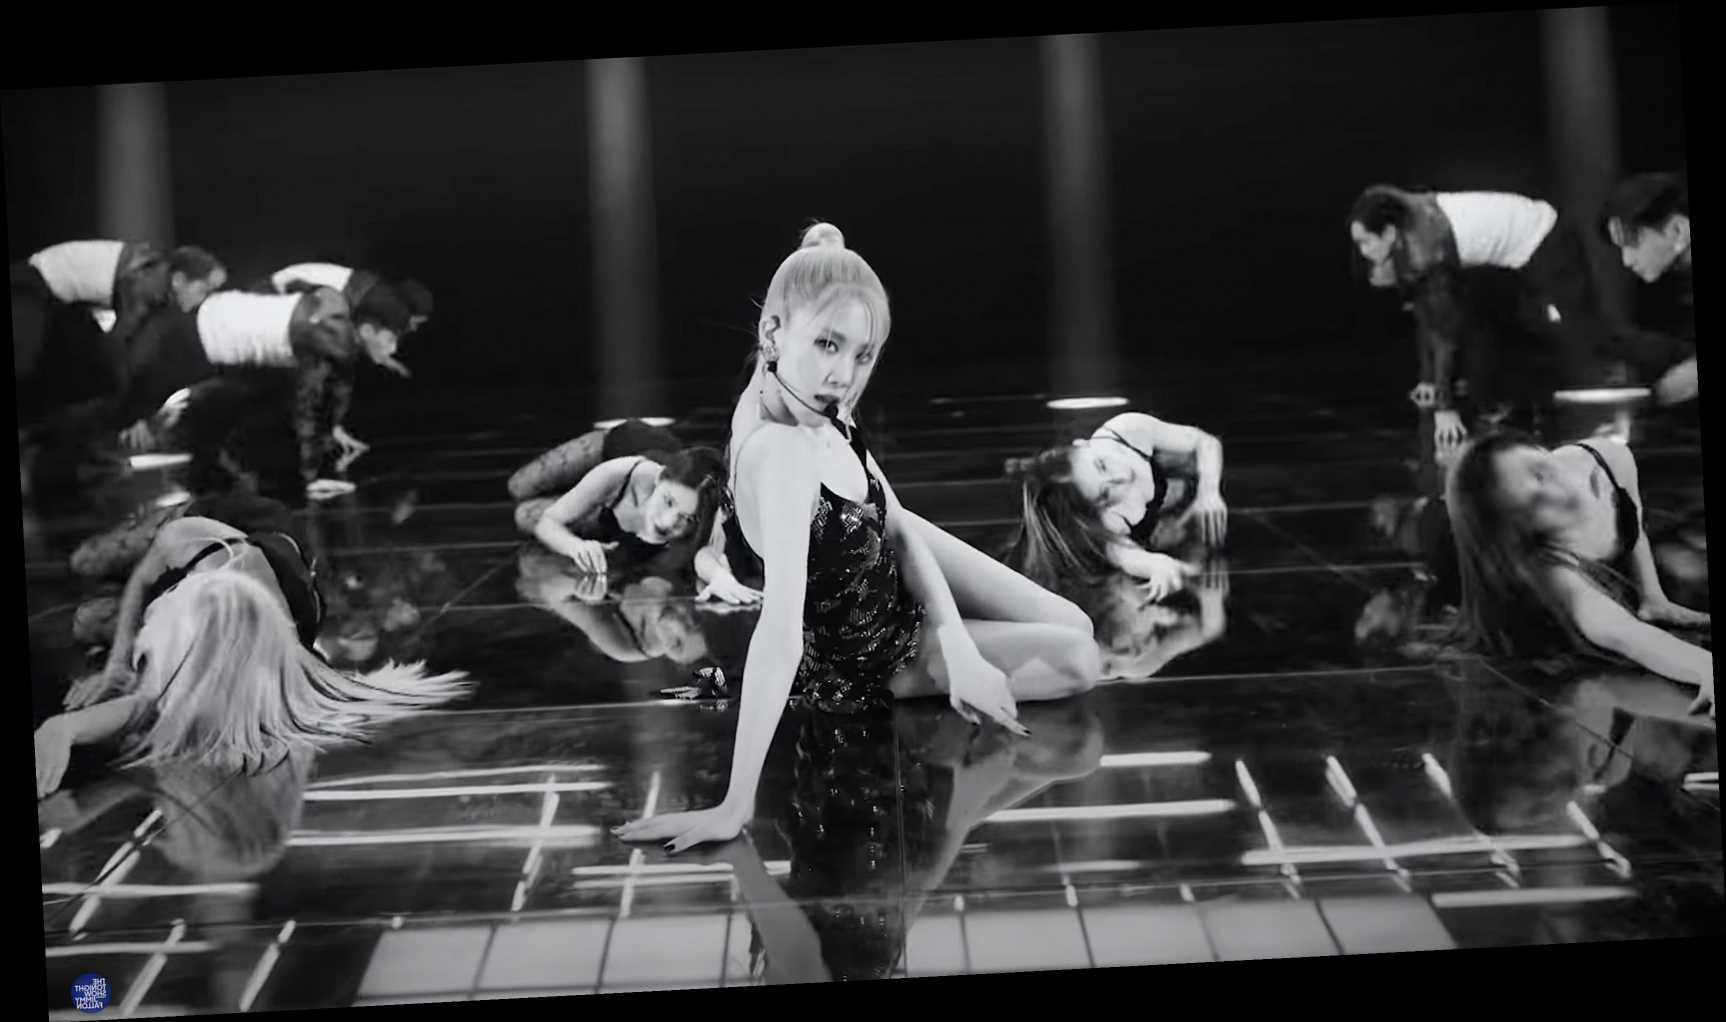 Blackpink's Rosé Breezes Through Elaborate 'On the Ground' Performance on 'Fallon'